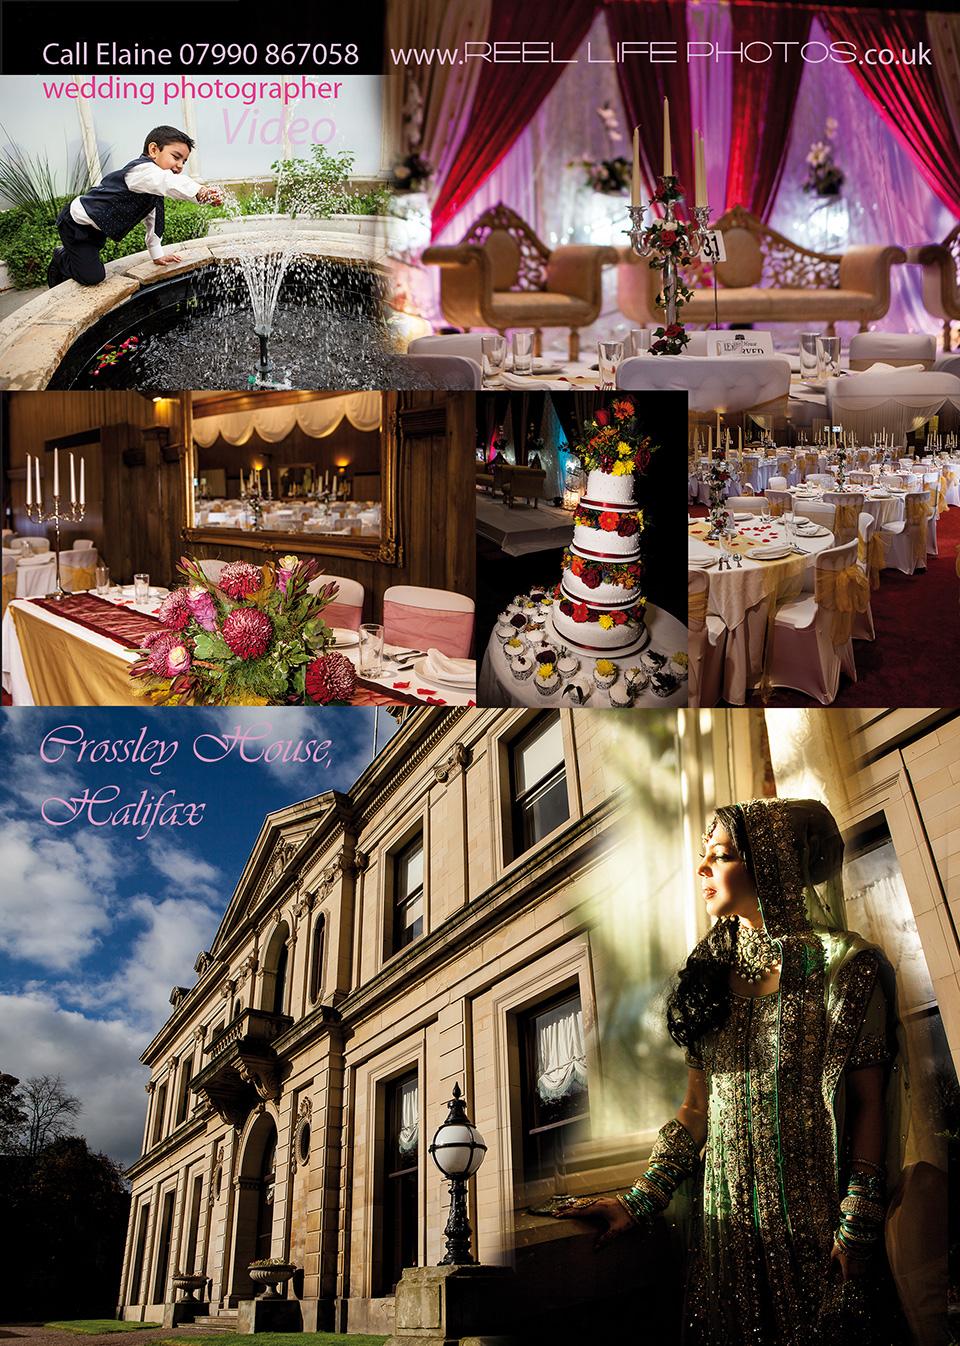 ReelLifePhotos Wedding Photography Blog Archive Crossley House Belle Vue Park Wedding Venue